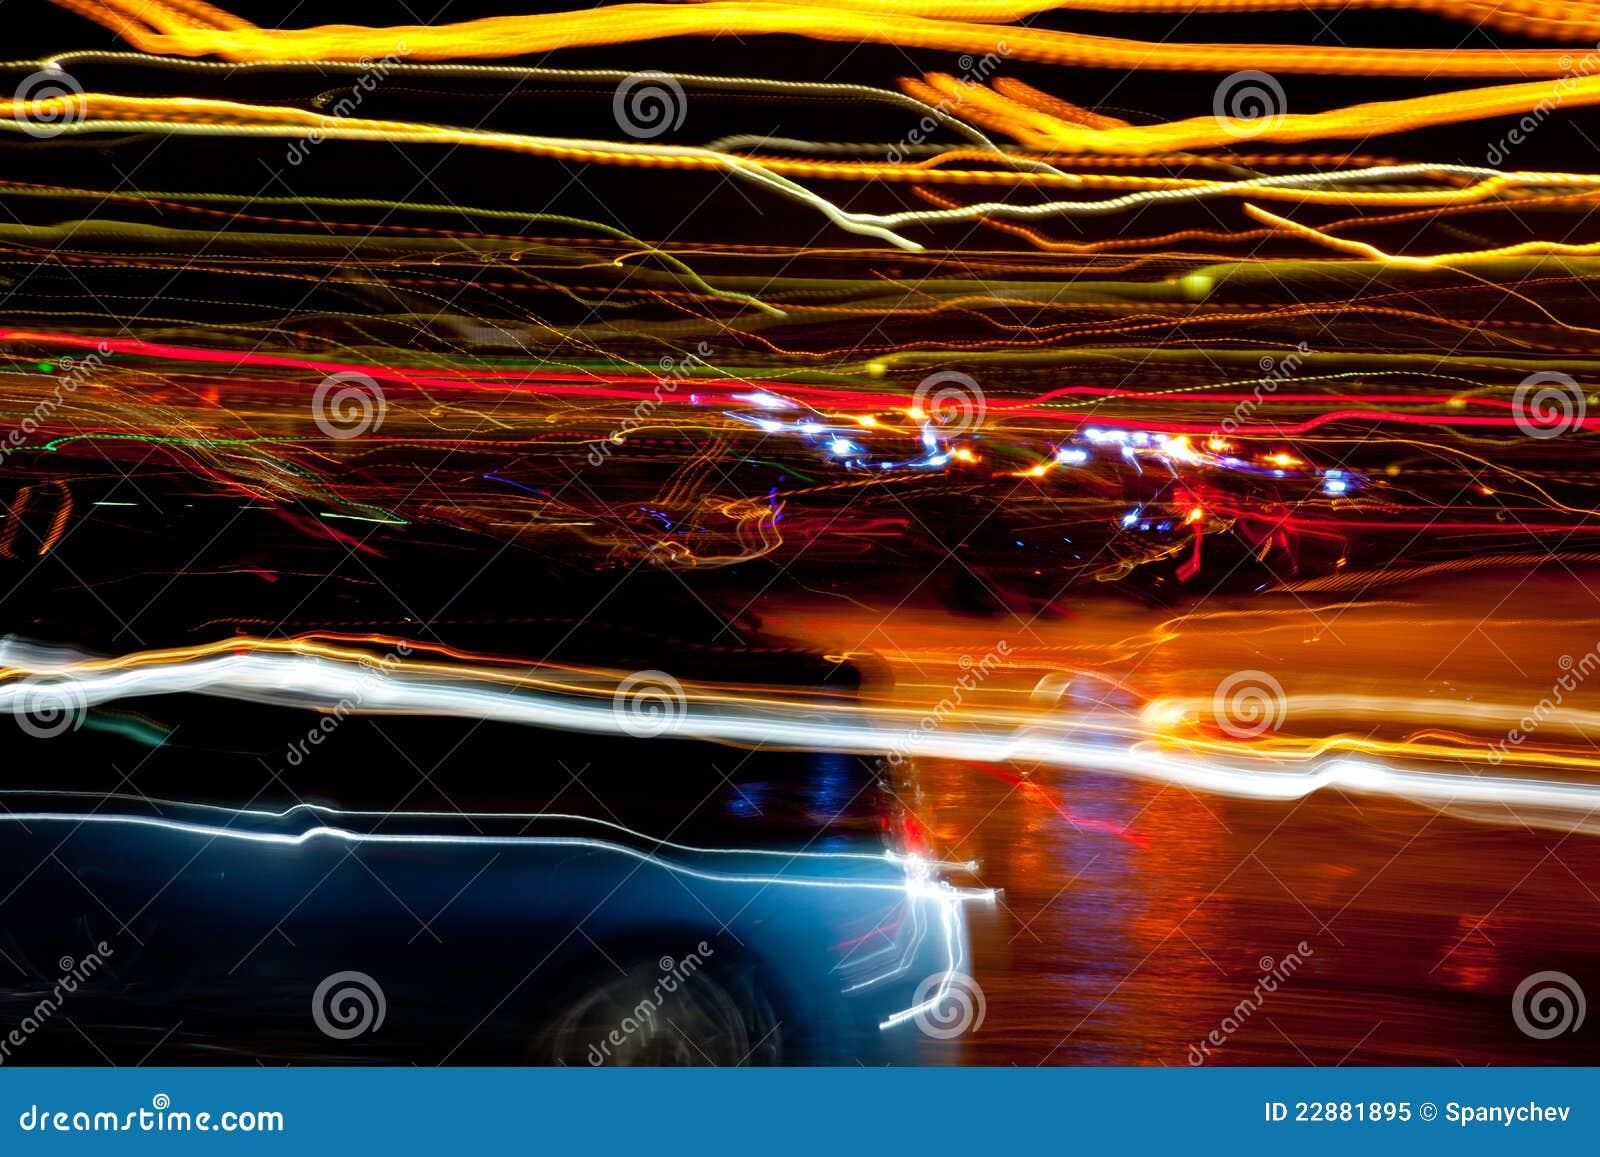 Blurred Street Lights Royalty Free Stock Photo - Image ...  Blurred Street ...